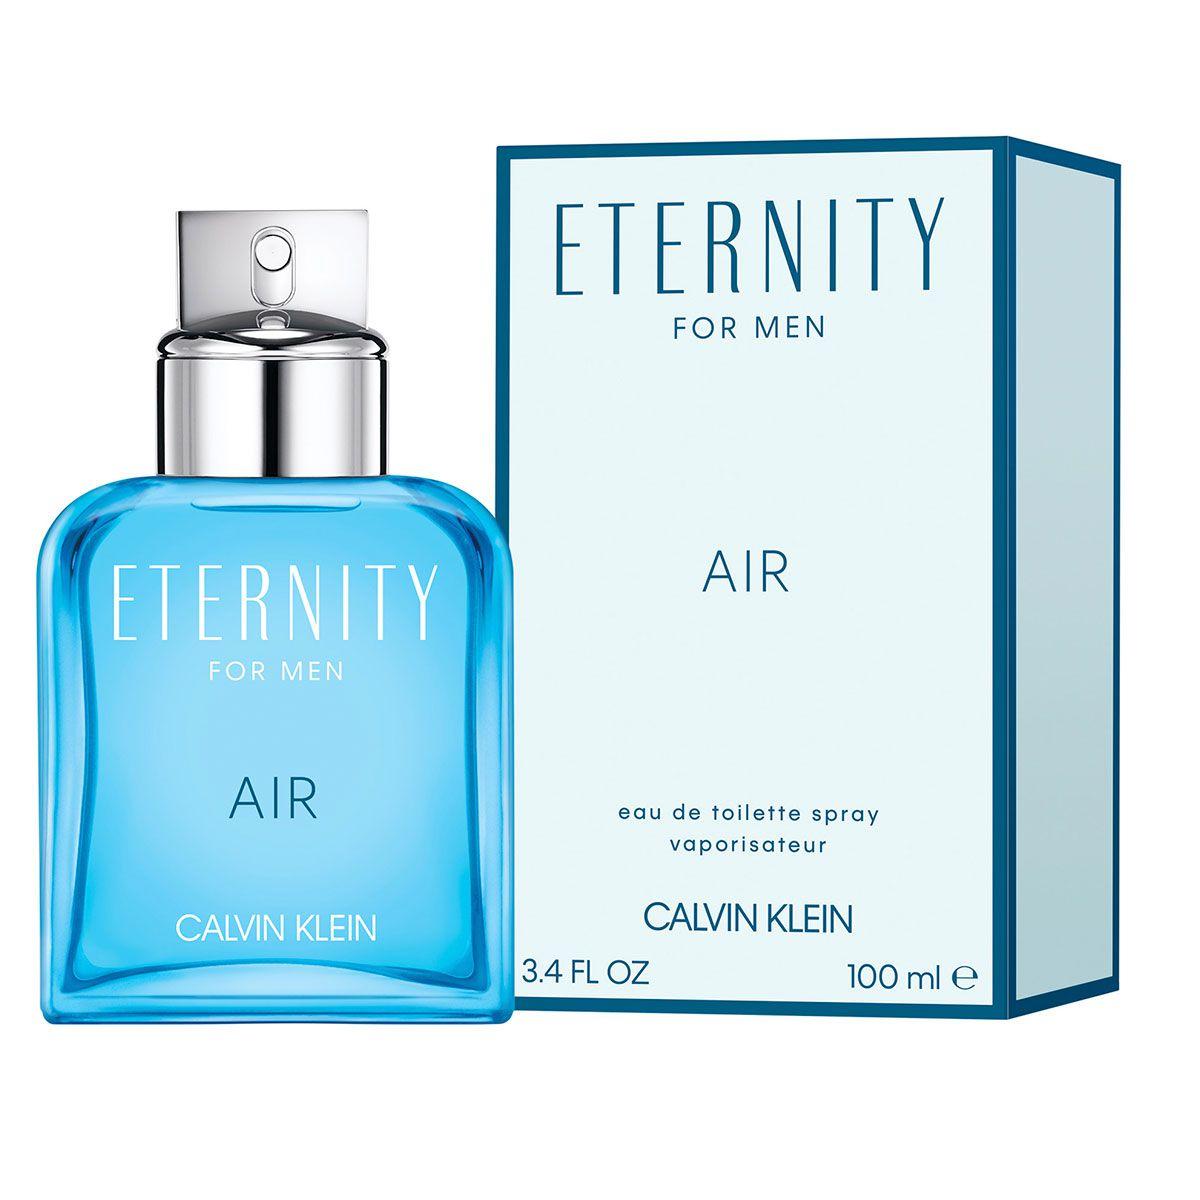 07737d90d Perfume Calvin Klein Eternity Air For Men Edt 30ml - Boutique dos ...